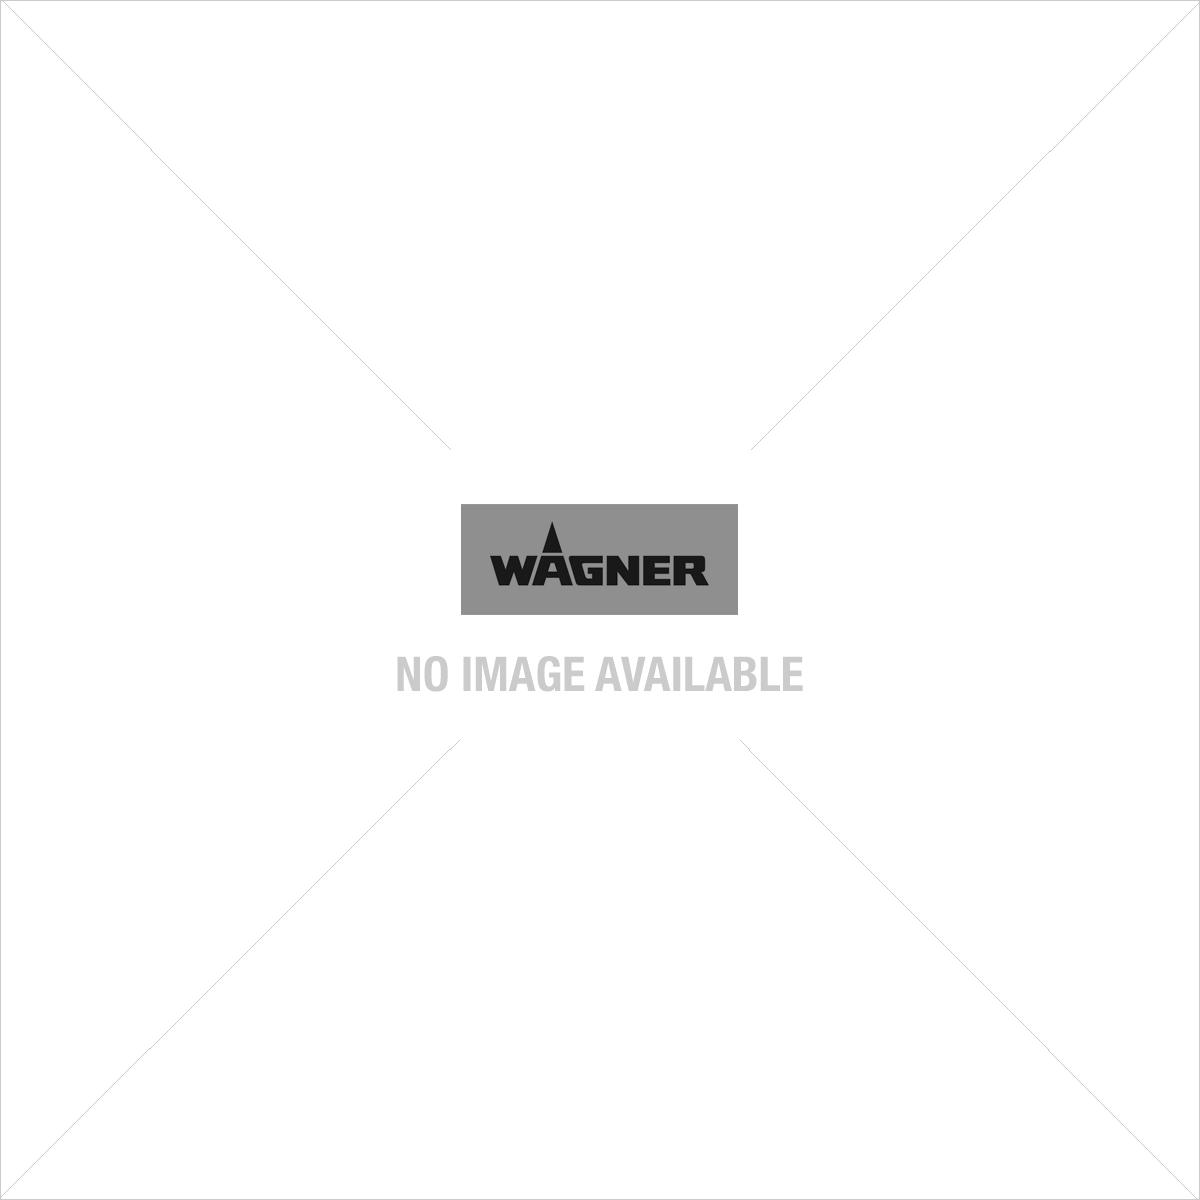 Wandfarbe Weiß - 10 Liter - Spray Solutions